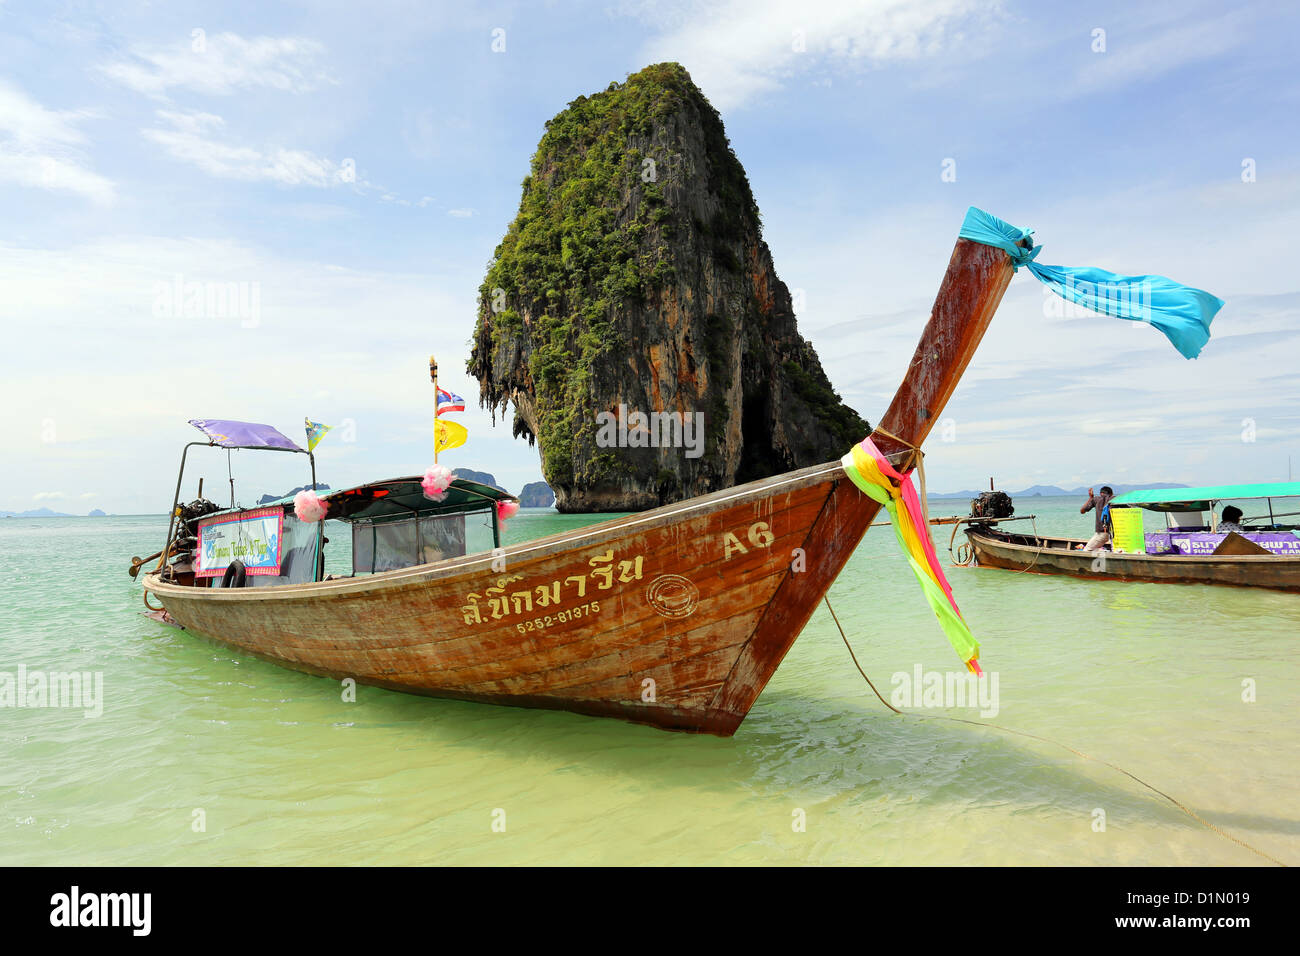 Traditionelle Thai Longtail-Boot am Phranang Cave Beach, Railay Beach, Krabi, Phuket, Thailand Stockbild